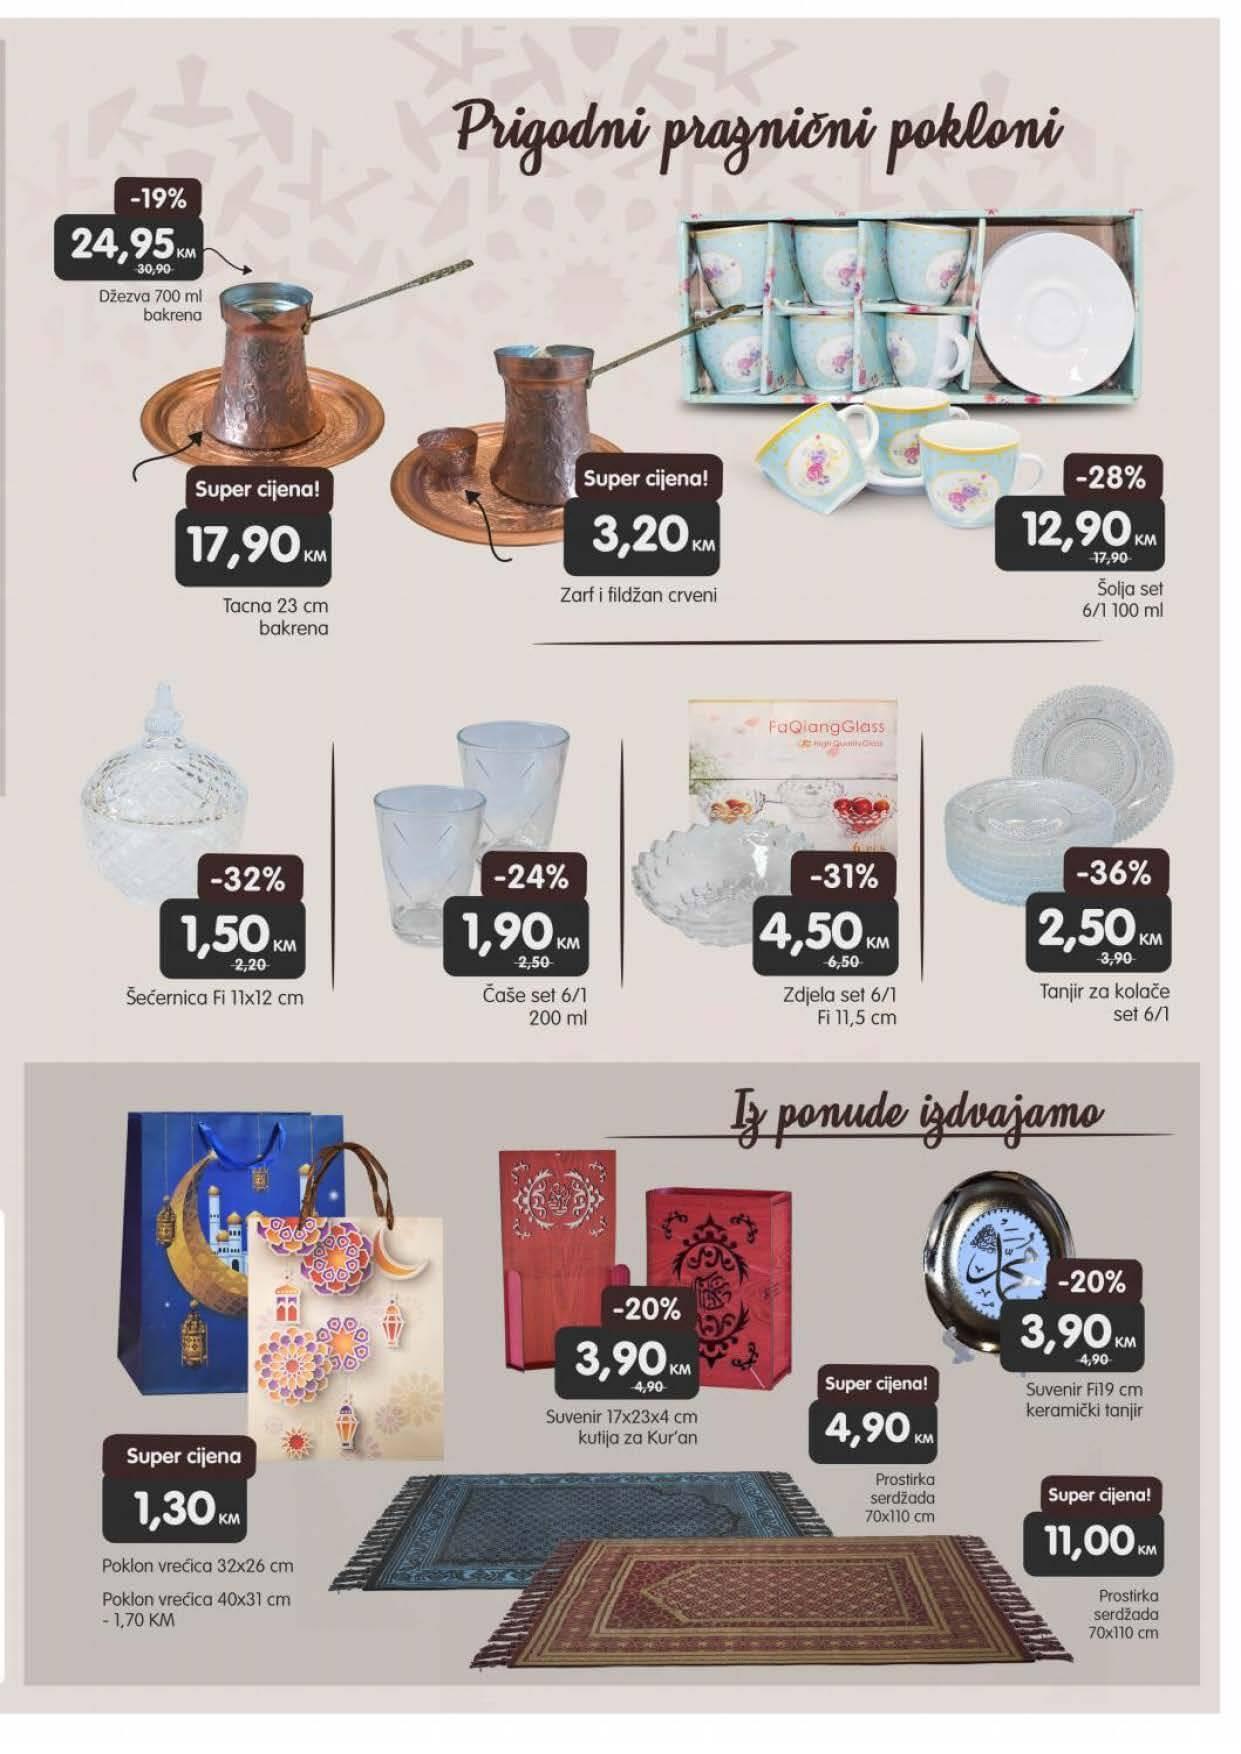 BINGO Katalog Bajrmaska ponuda JUL 2021 15.7.2021. 21.7.2021. Page 13